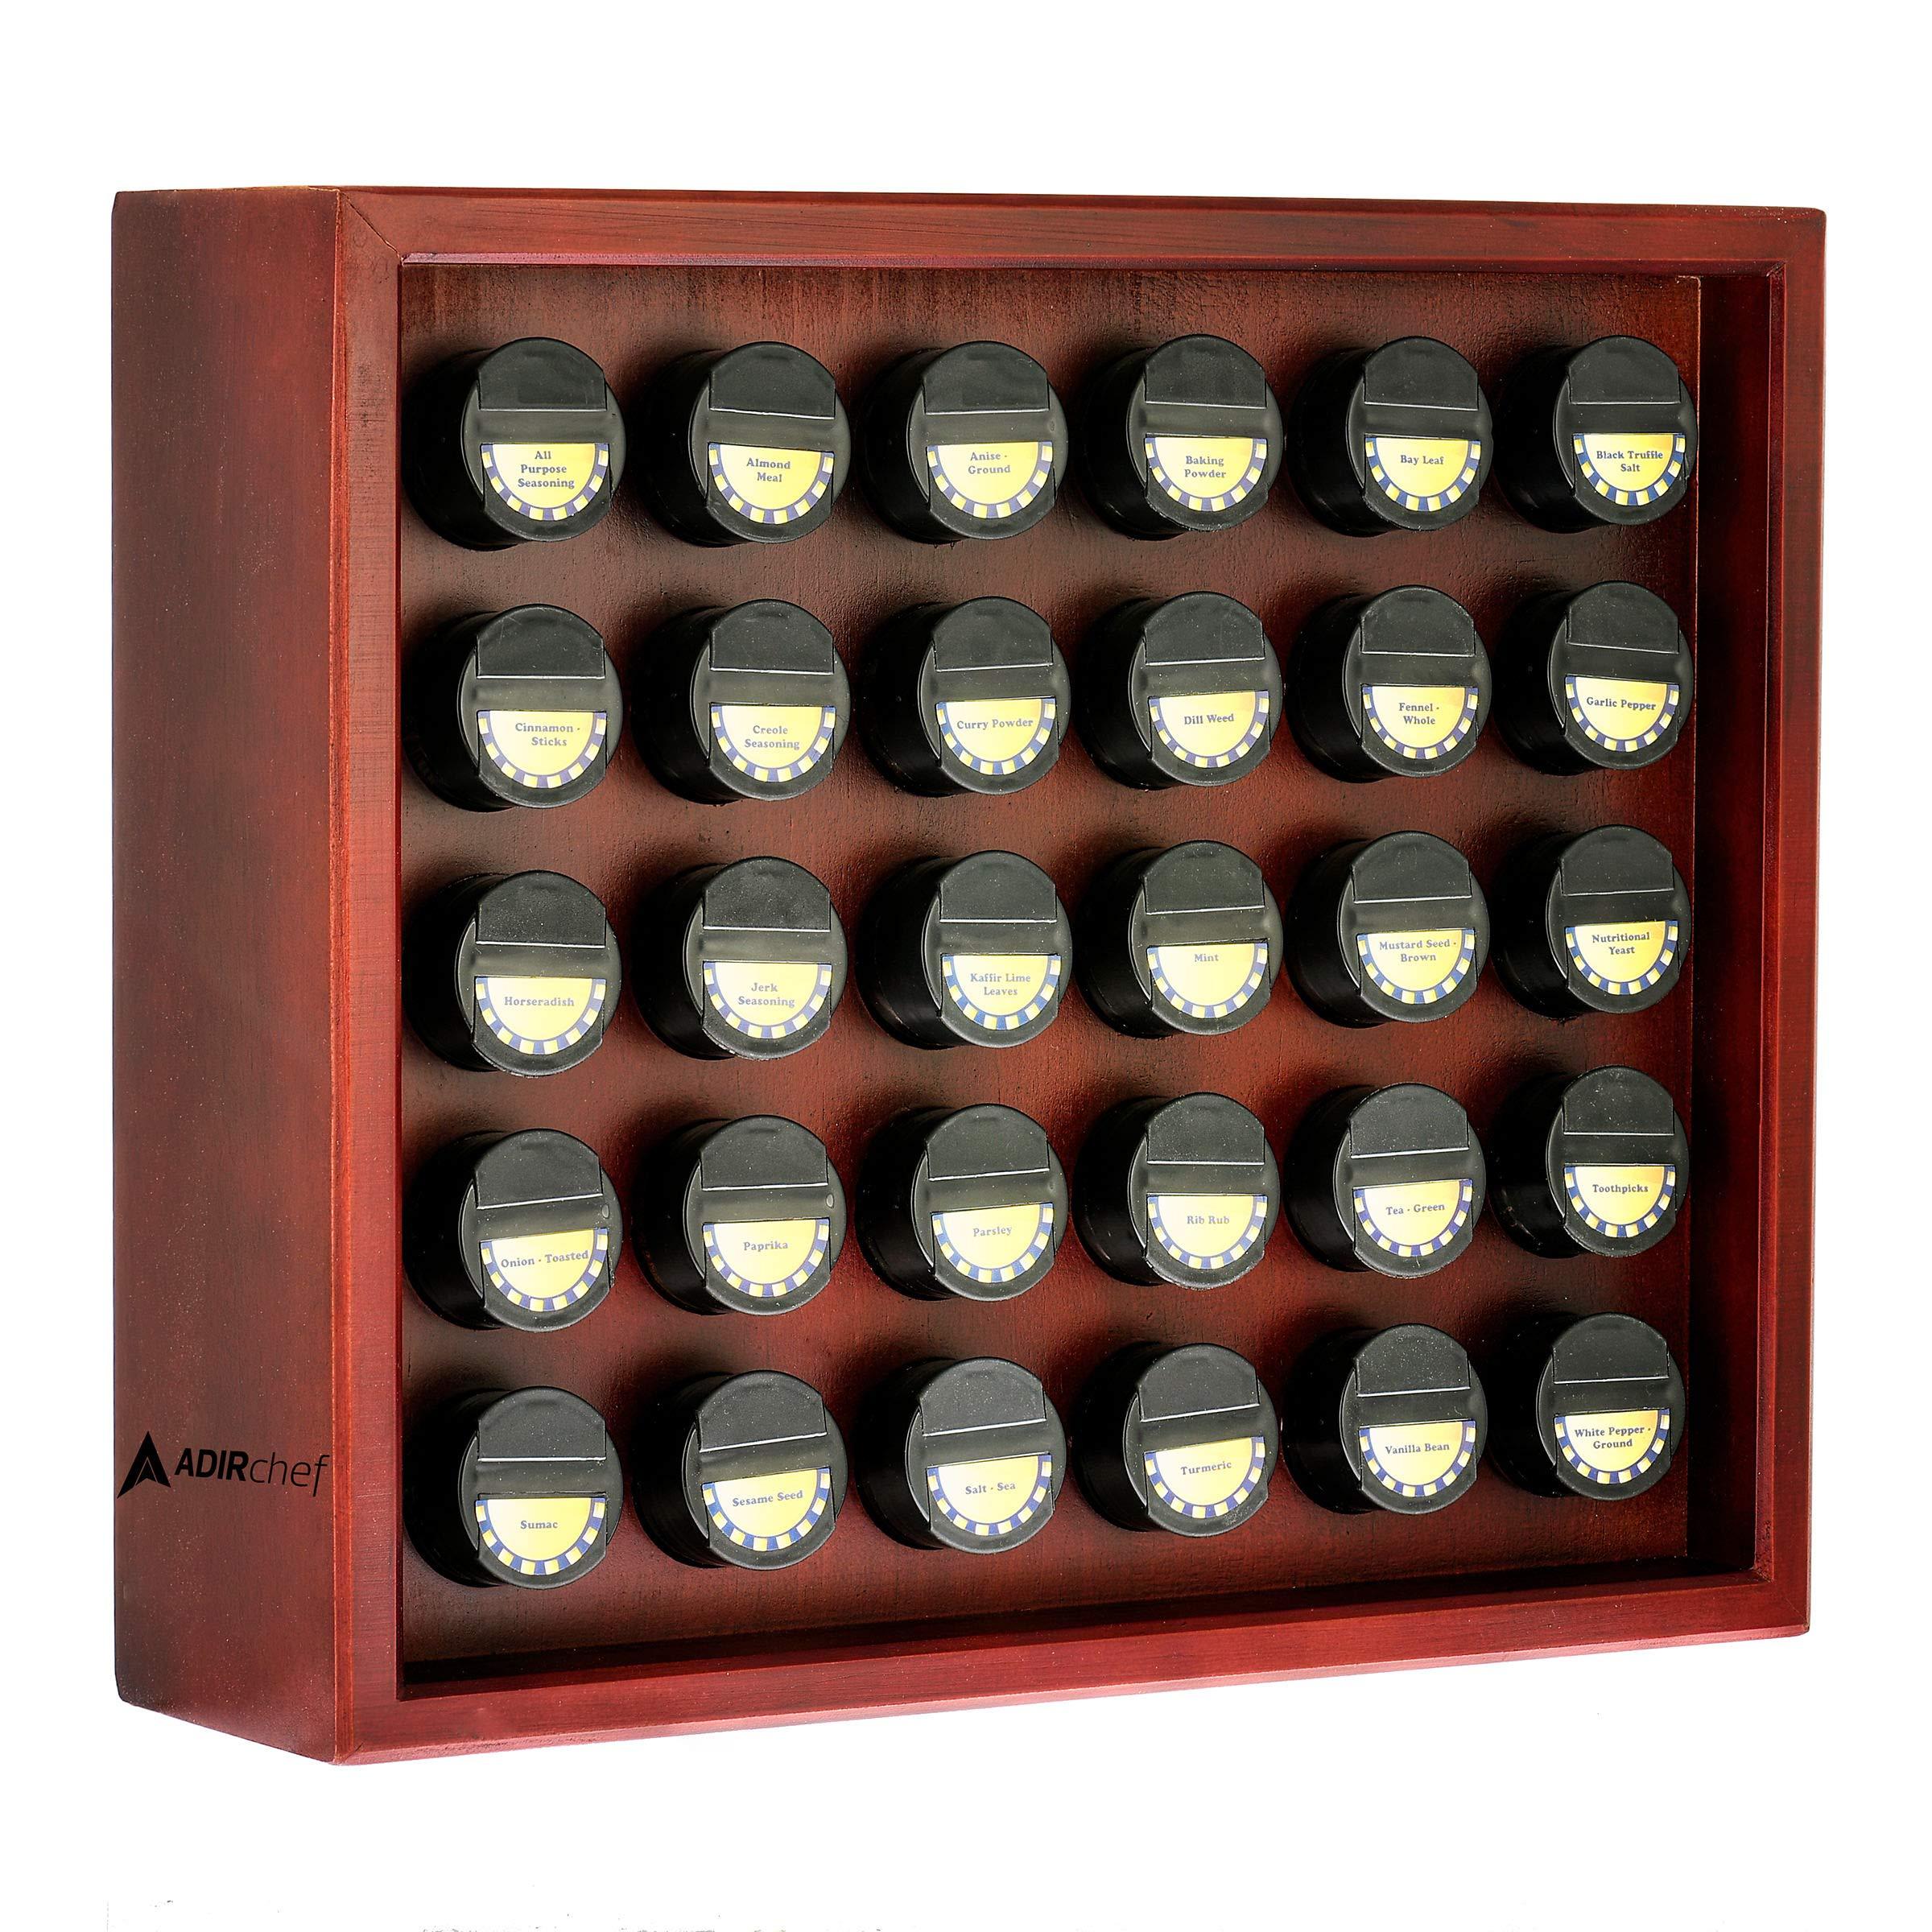 AdirChef Wooden Spice Rack - Stand Alone Classic Wooden Spice Organizer for Home & Kitchen (Cherry) (14'' x 16'') by AdirChef